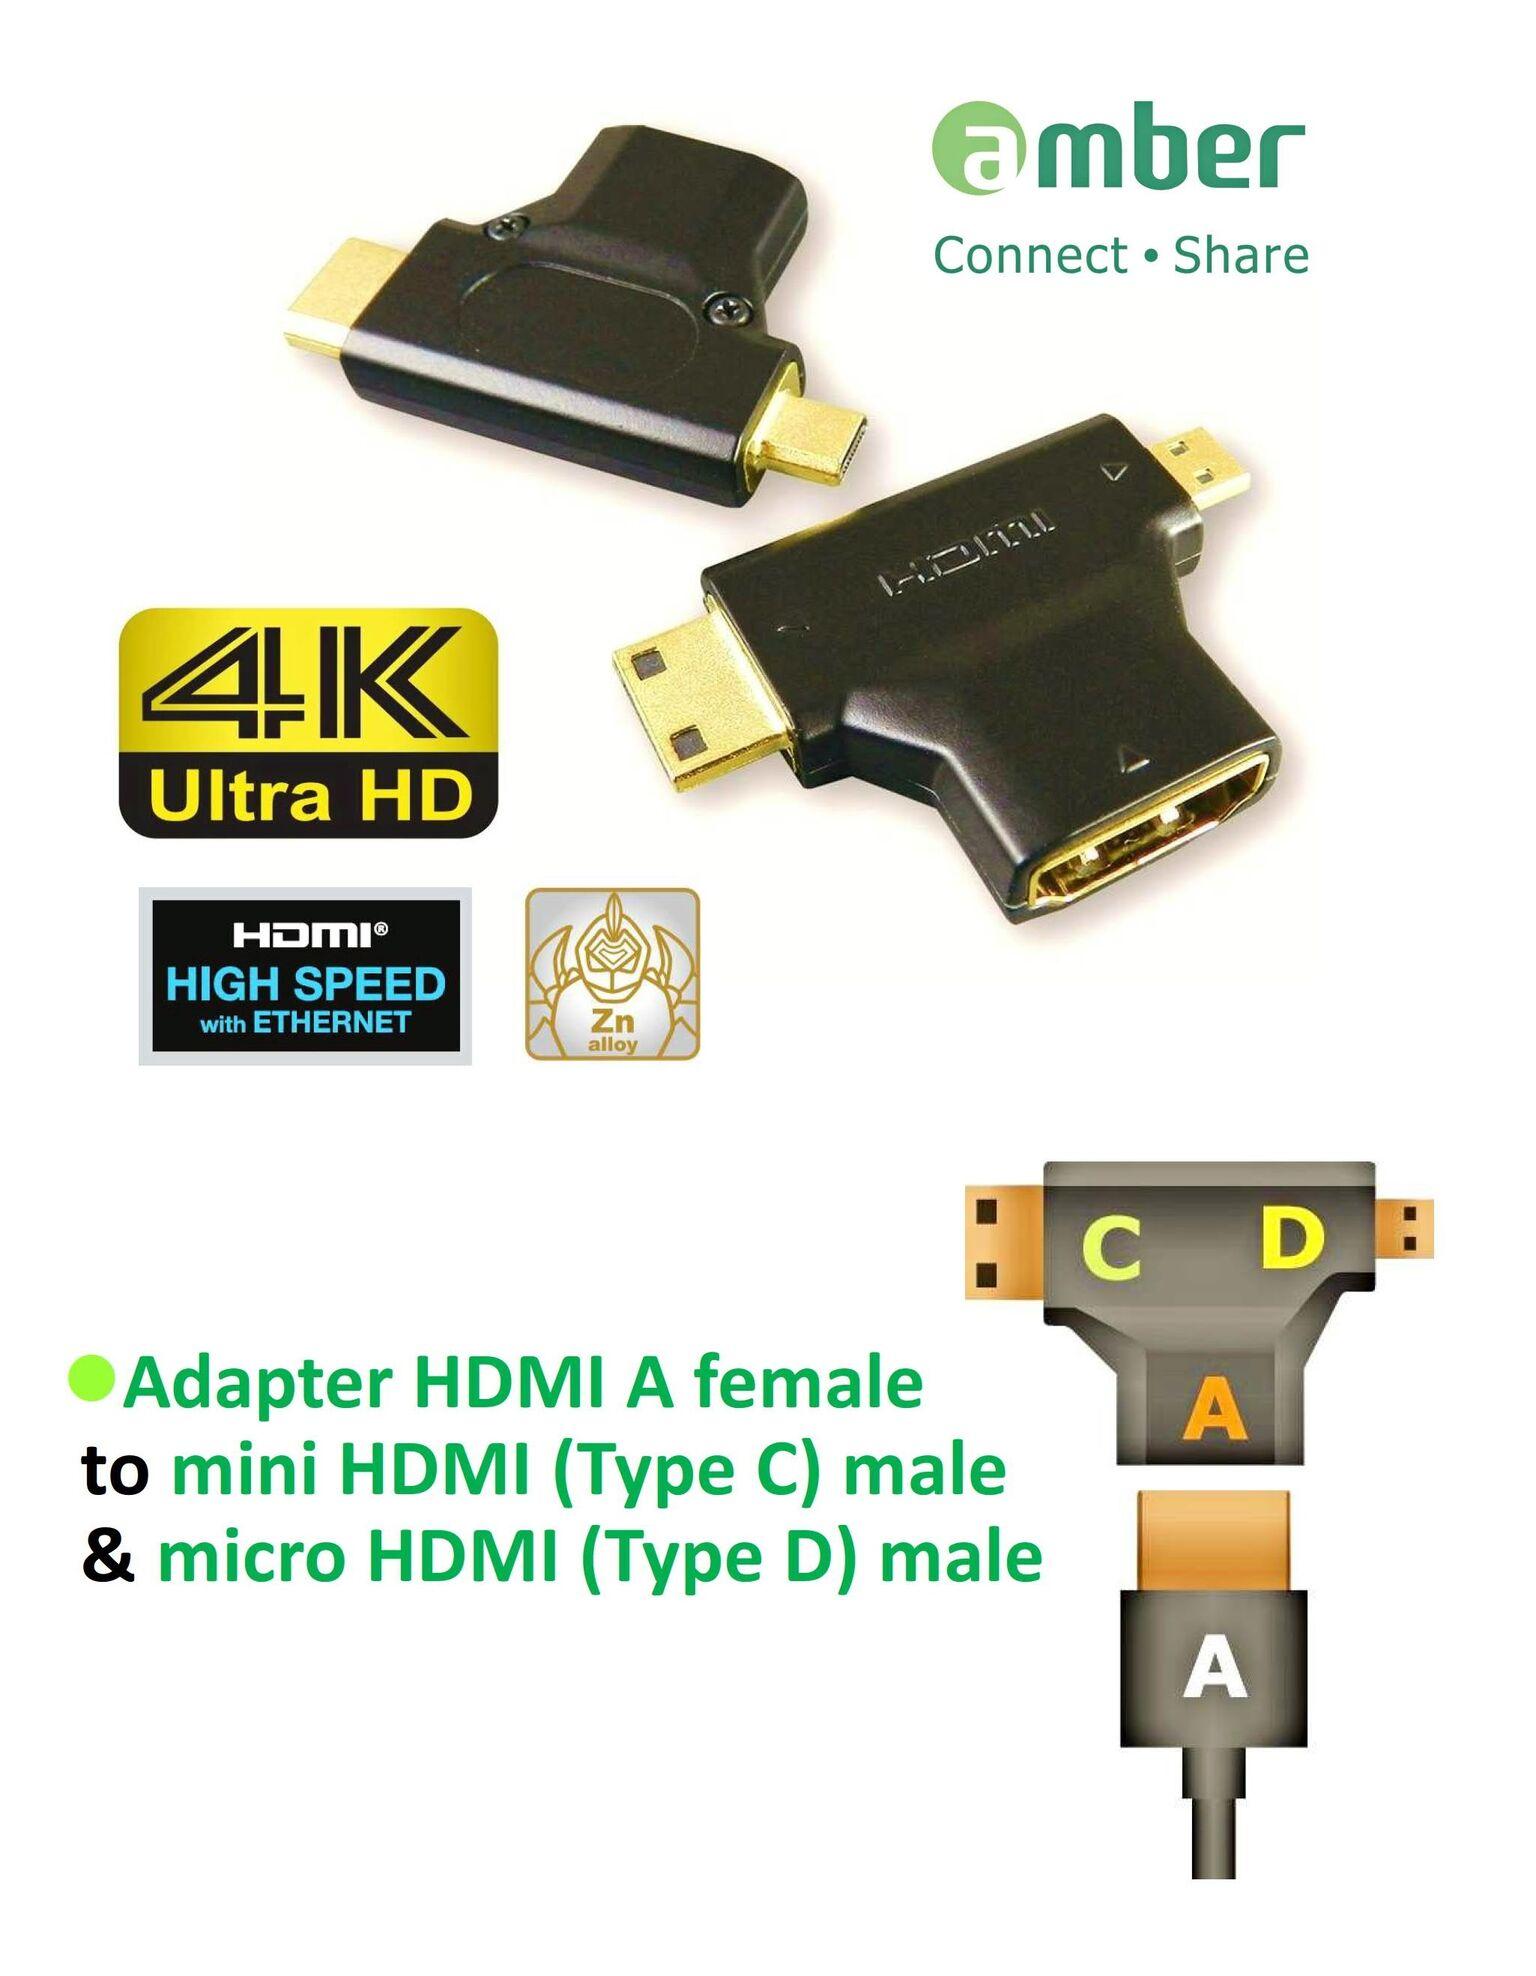 hm-acd2-p02.jpg